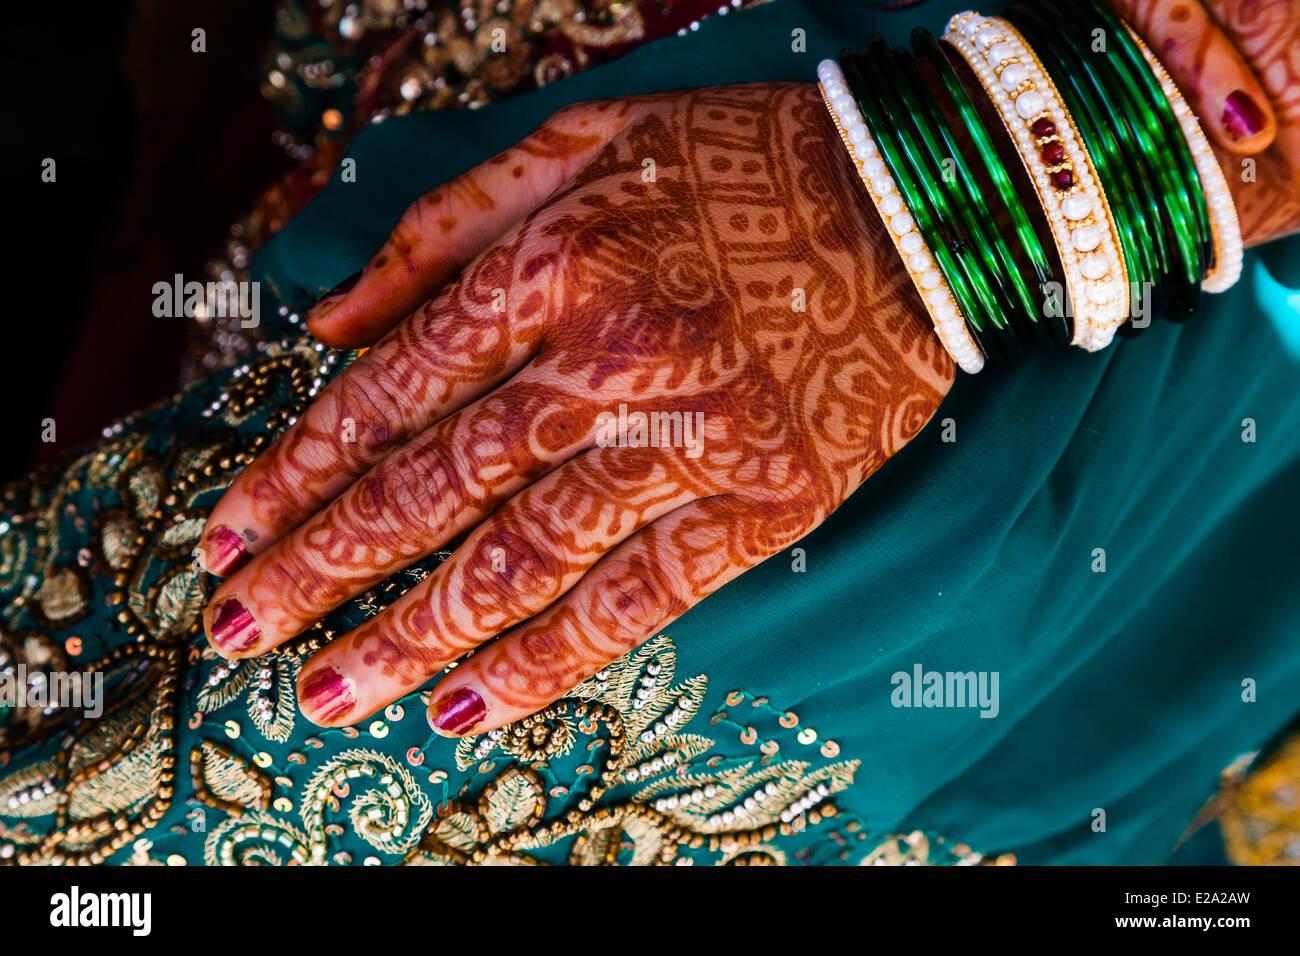 India, Maharashtra state, Trimbak, bride hand with henna tattoos - Stock Image